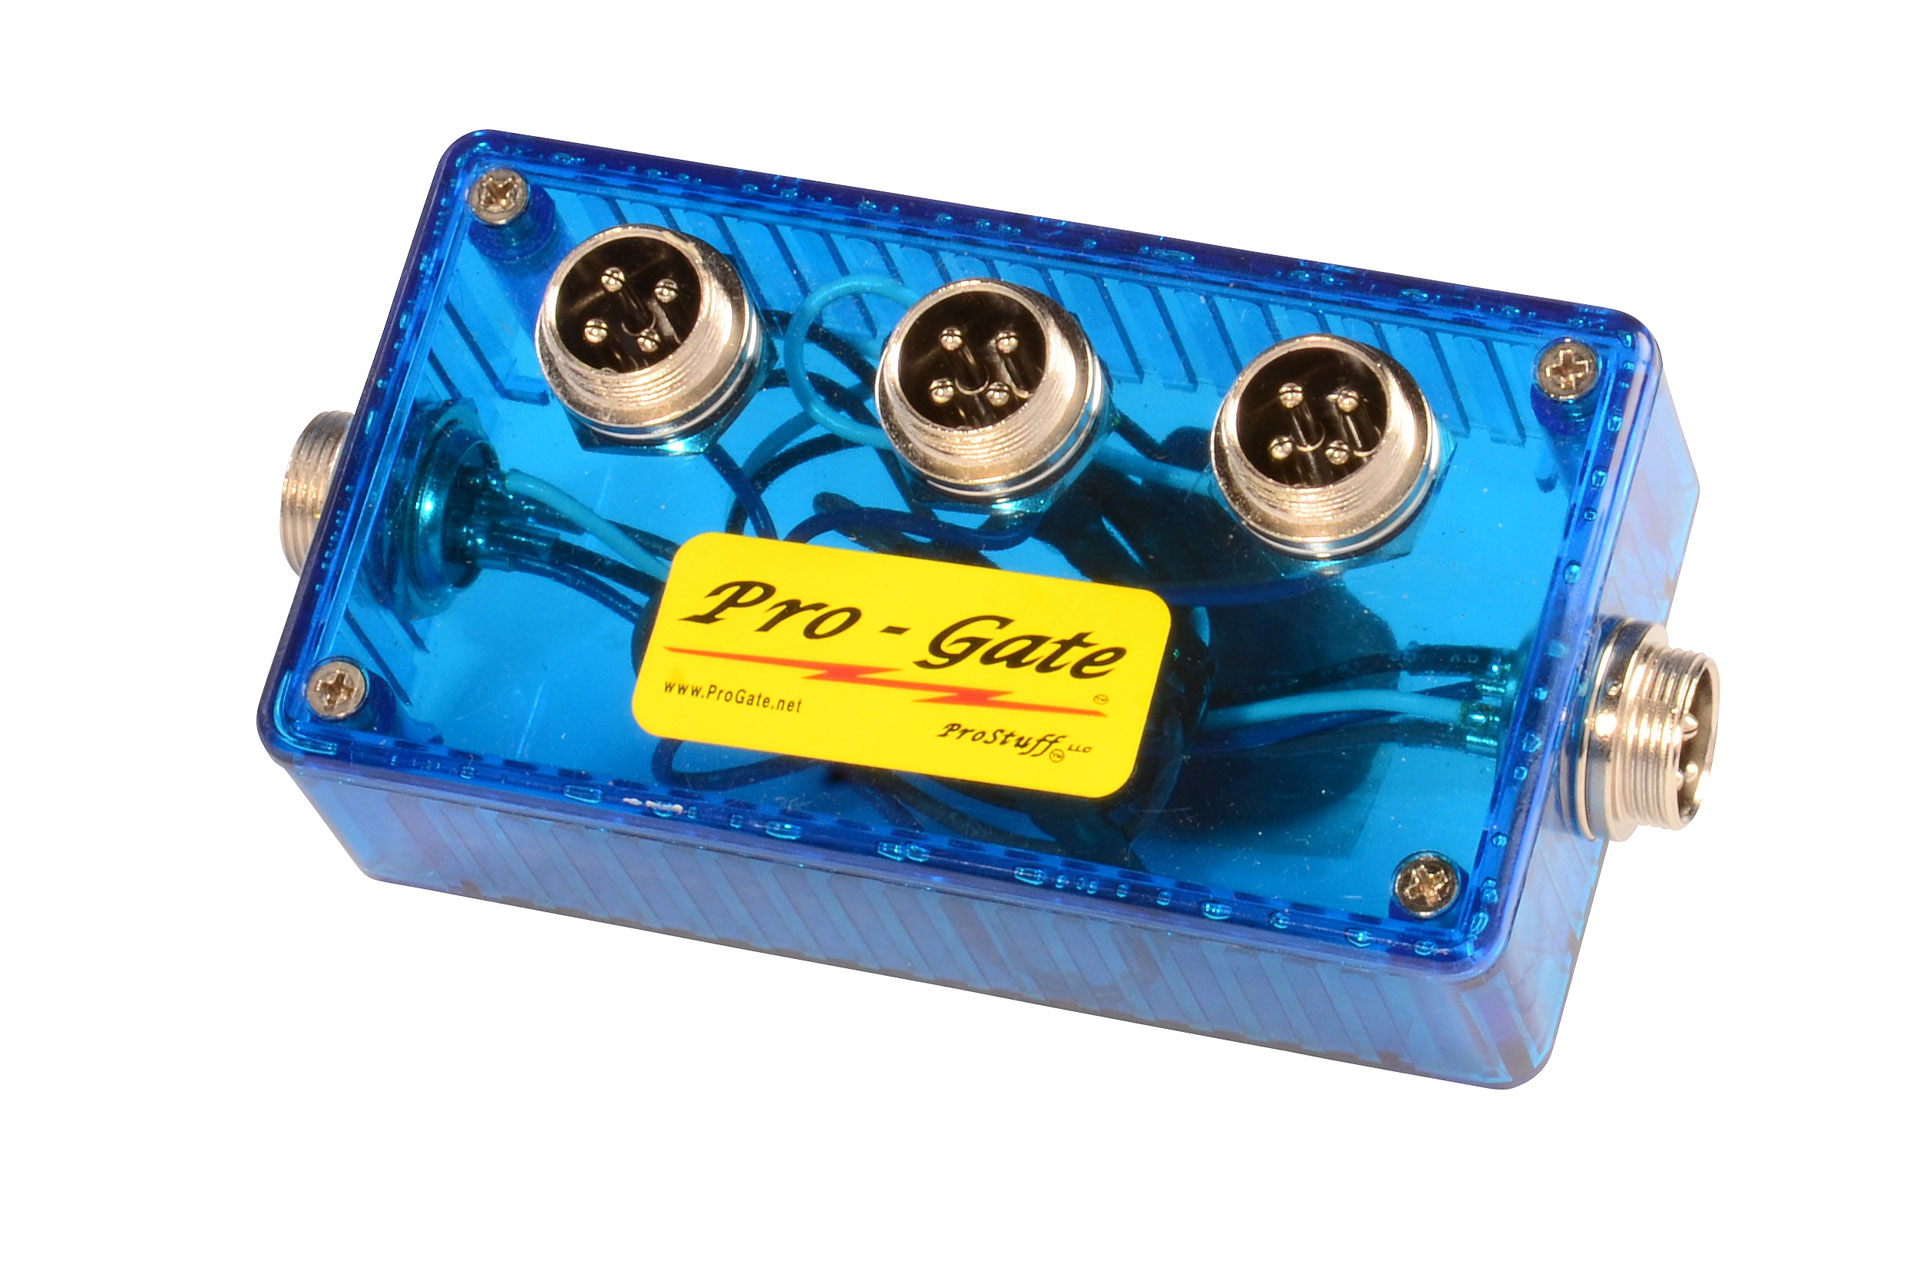 Pro Gate Five-Port Splitter Box